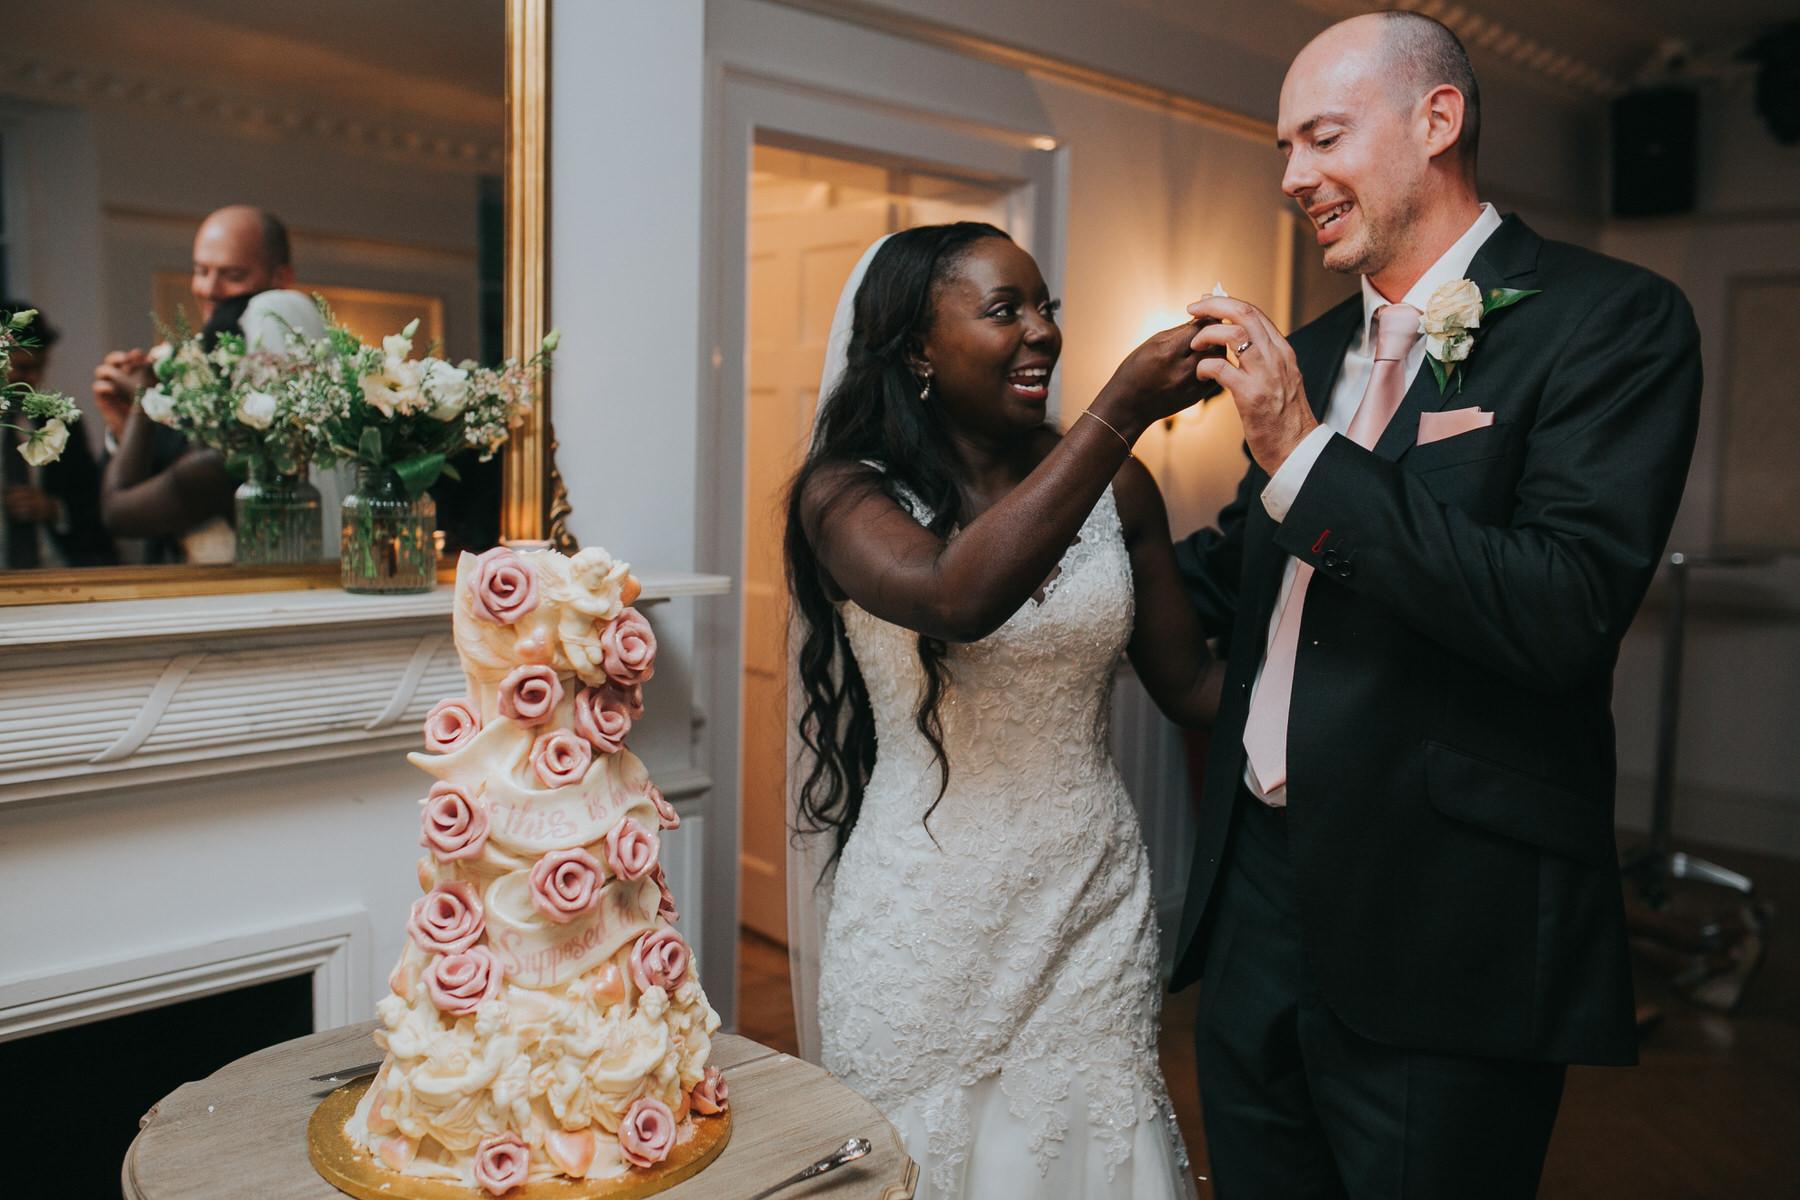 302-Belair House bride groom cutting  Choccywoccydoodah wedding cake.jpg